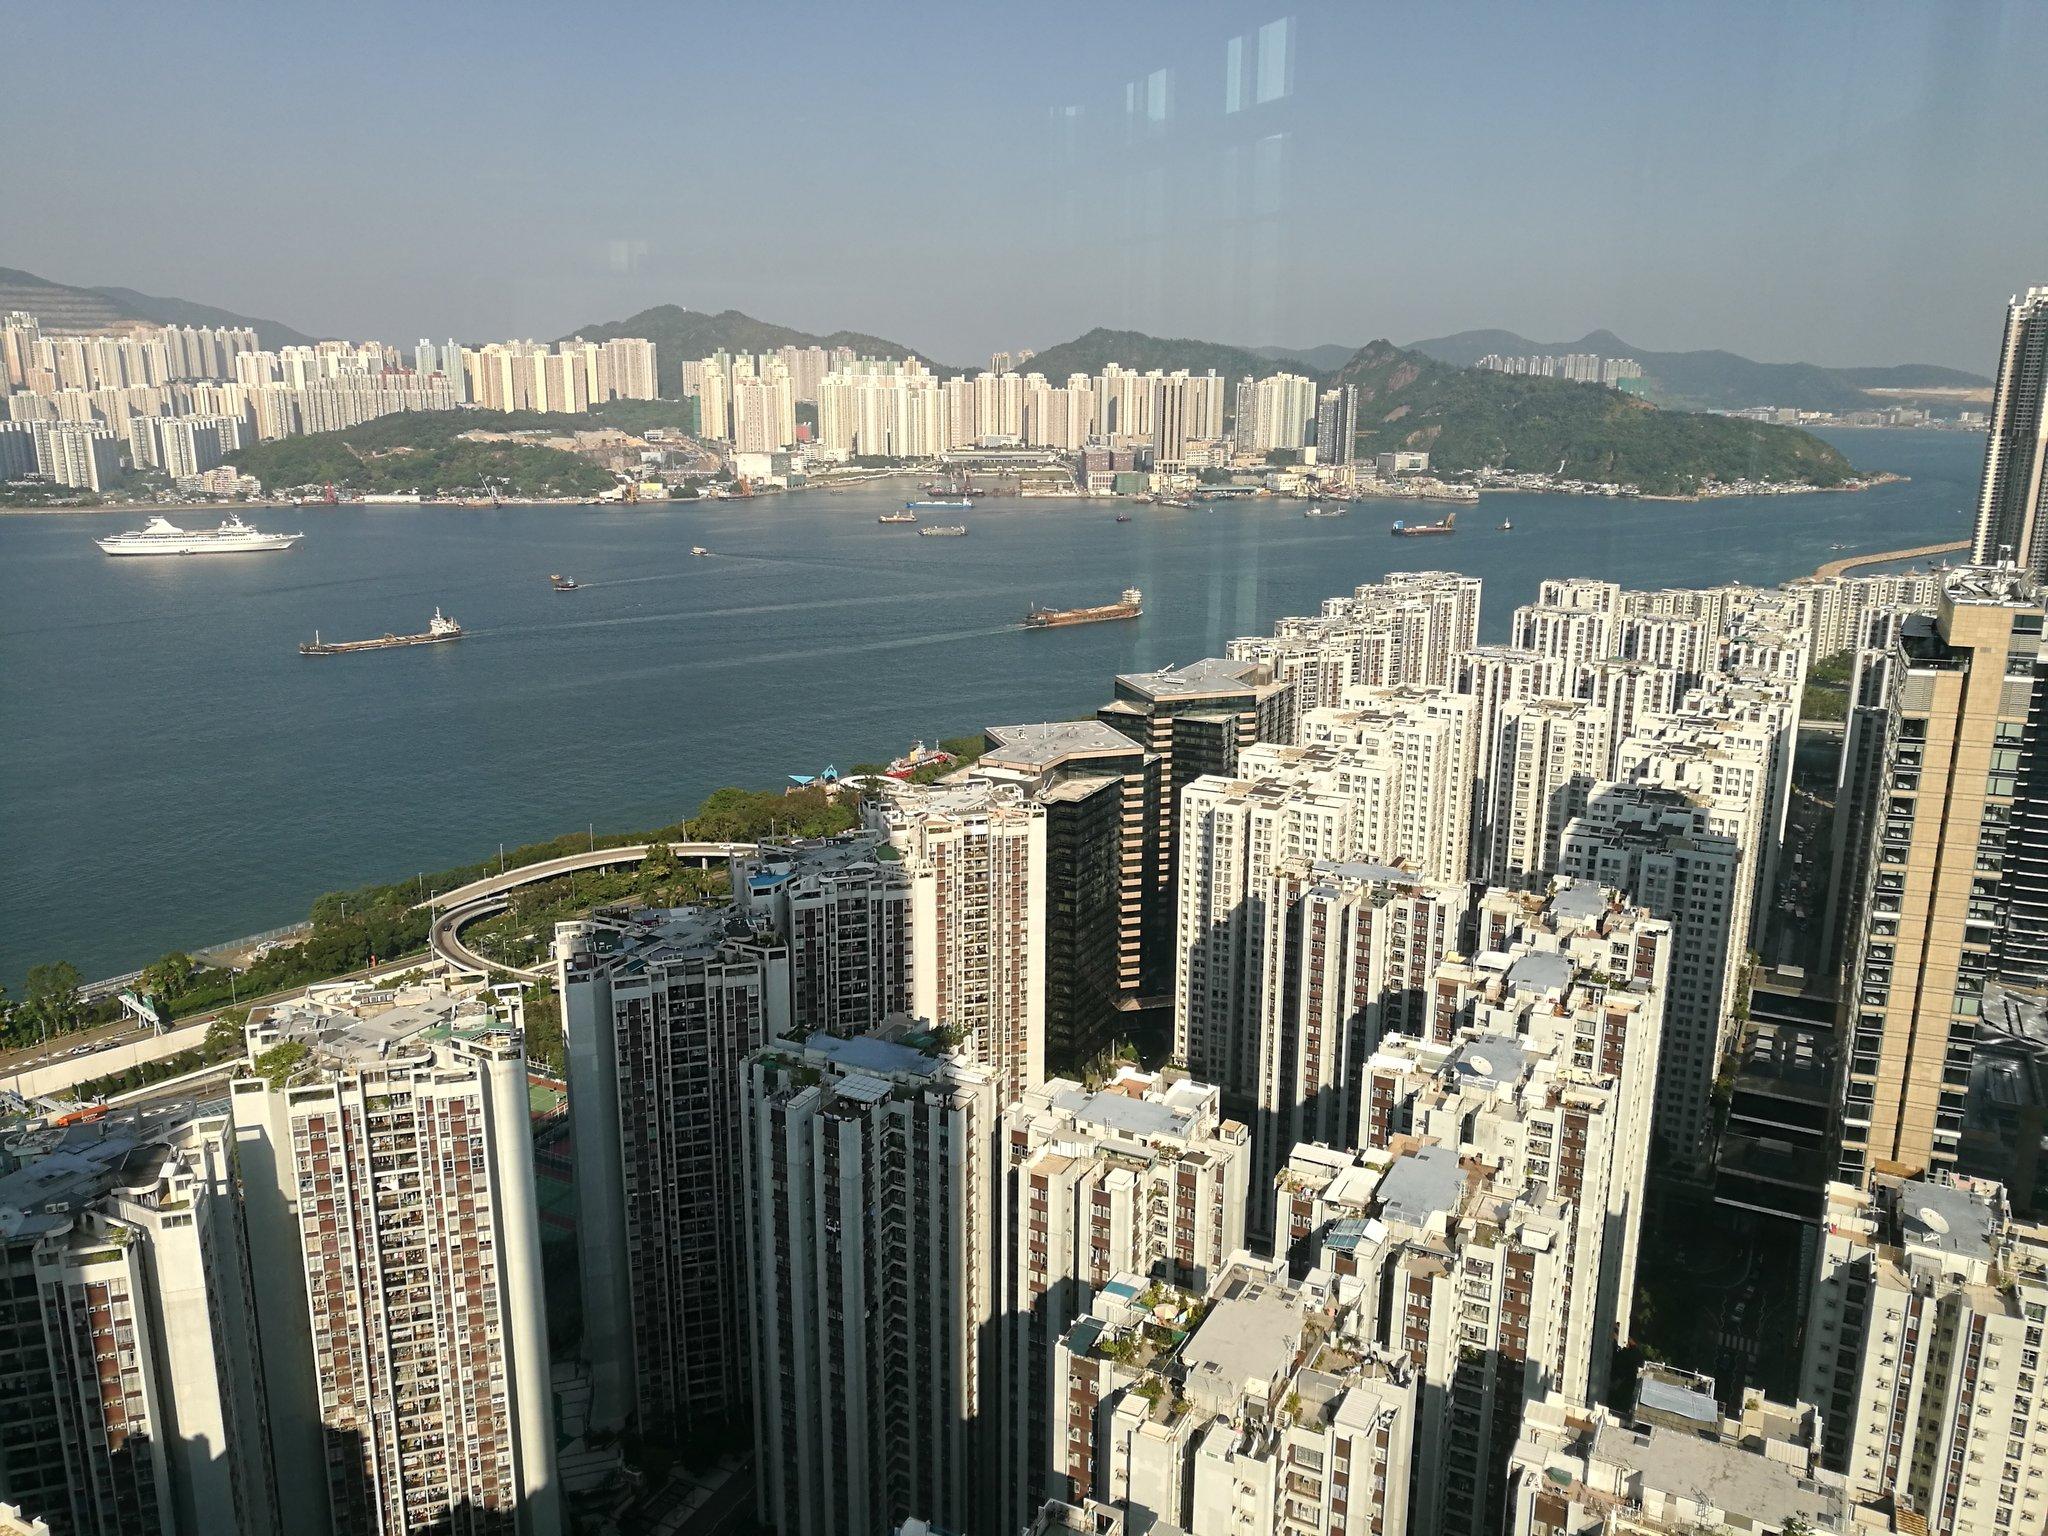 Expensive high density living https://t.co/uh5RQ4TR4g